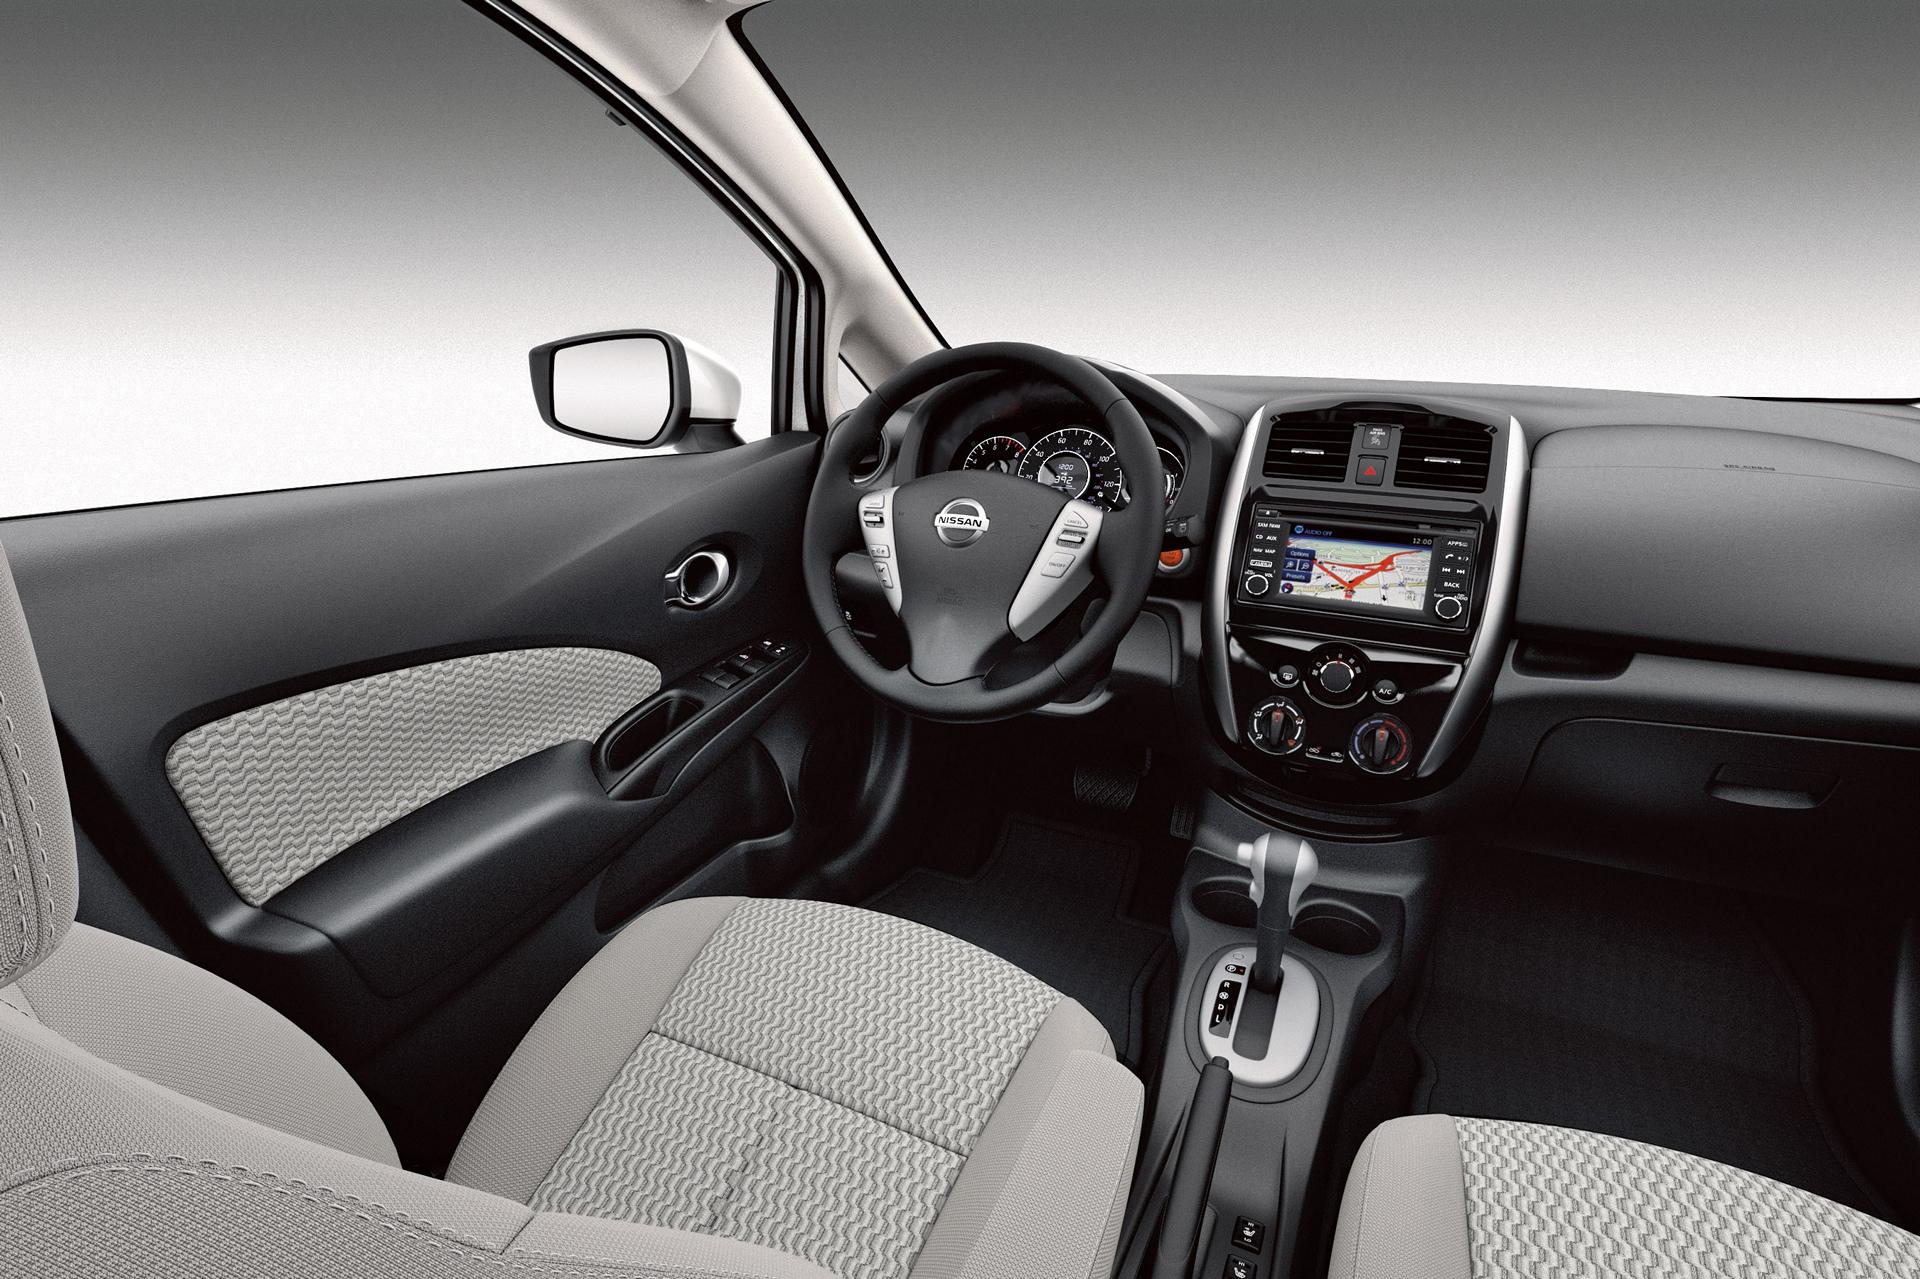 2016 Nissan Versa Note C Nissan Motor Co Ltd Carrrs Auto Portal